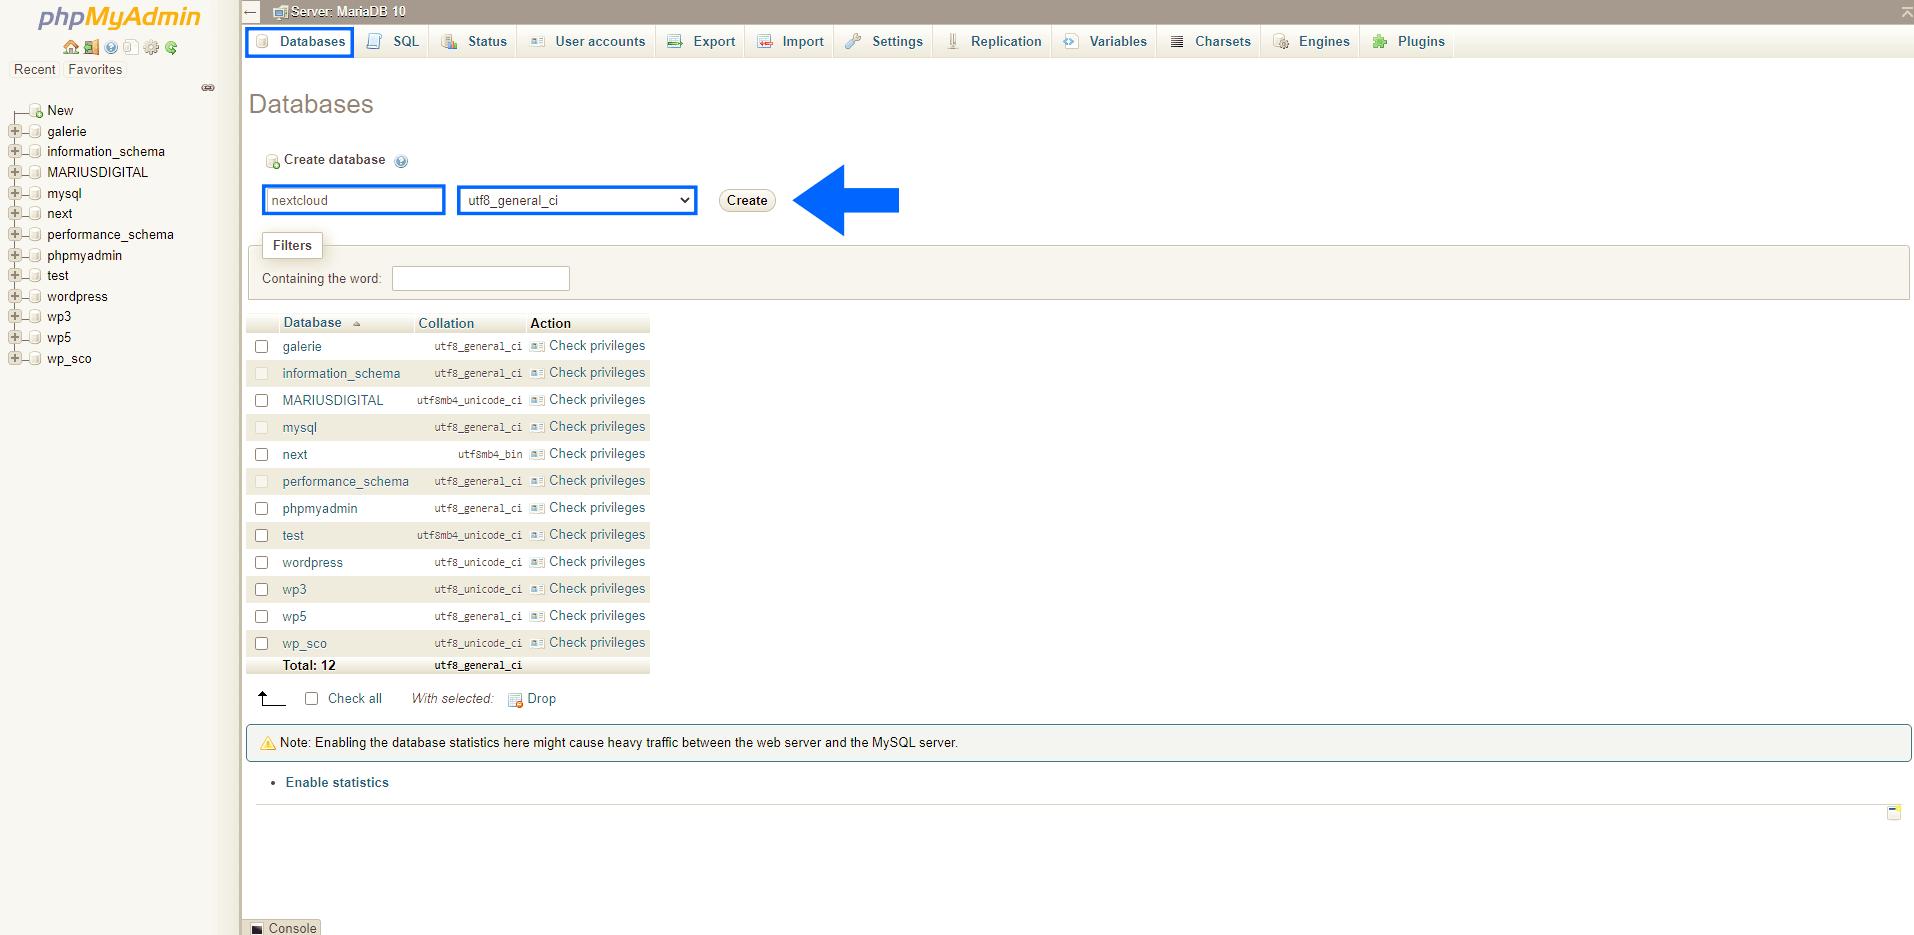 1 Synology NAS nextcloud DSM 7 create database phpMyAdmin